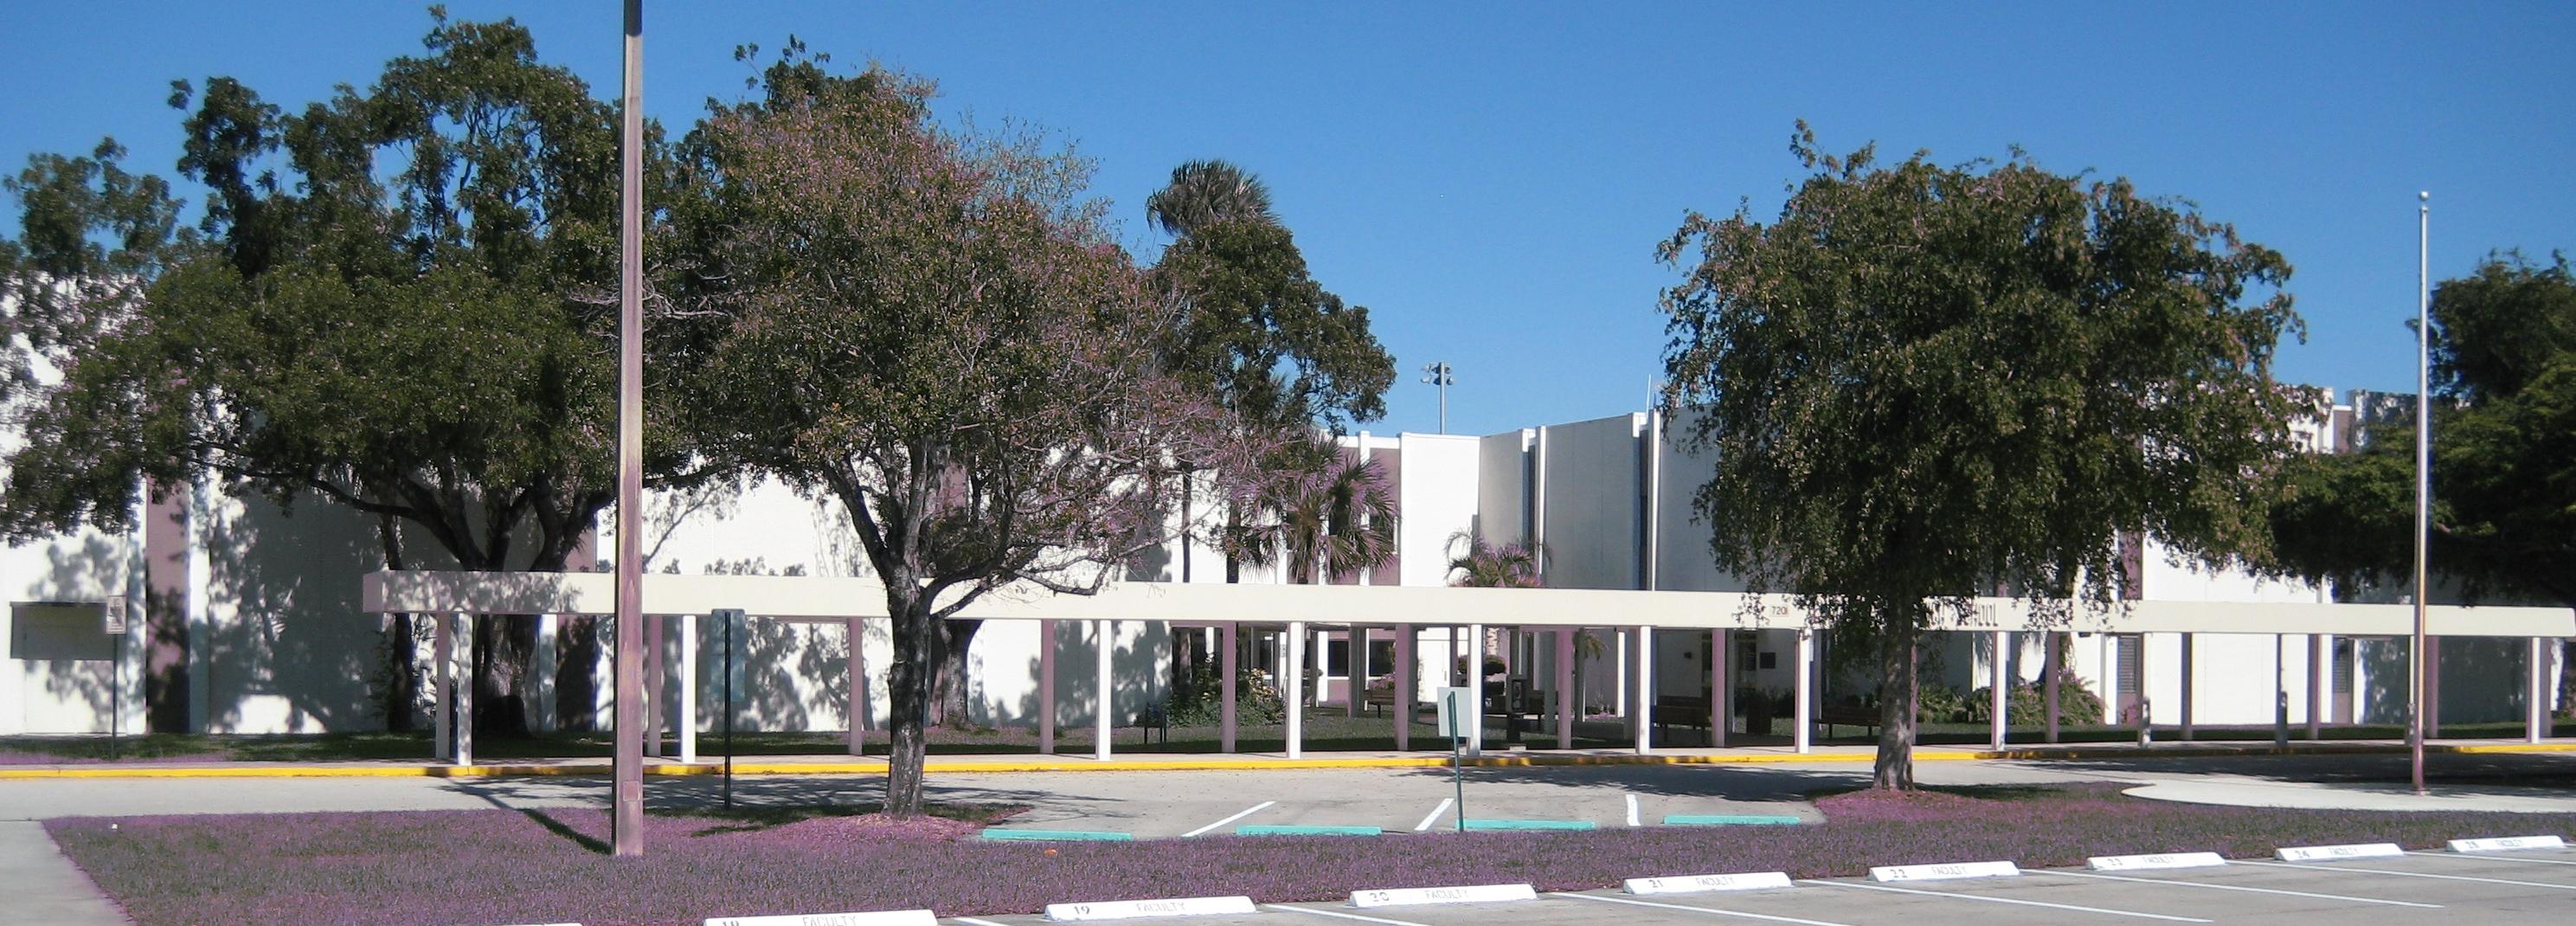 High Schools In Jacksonville Beach Fl